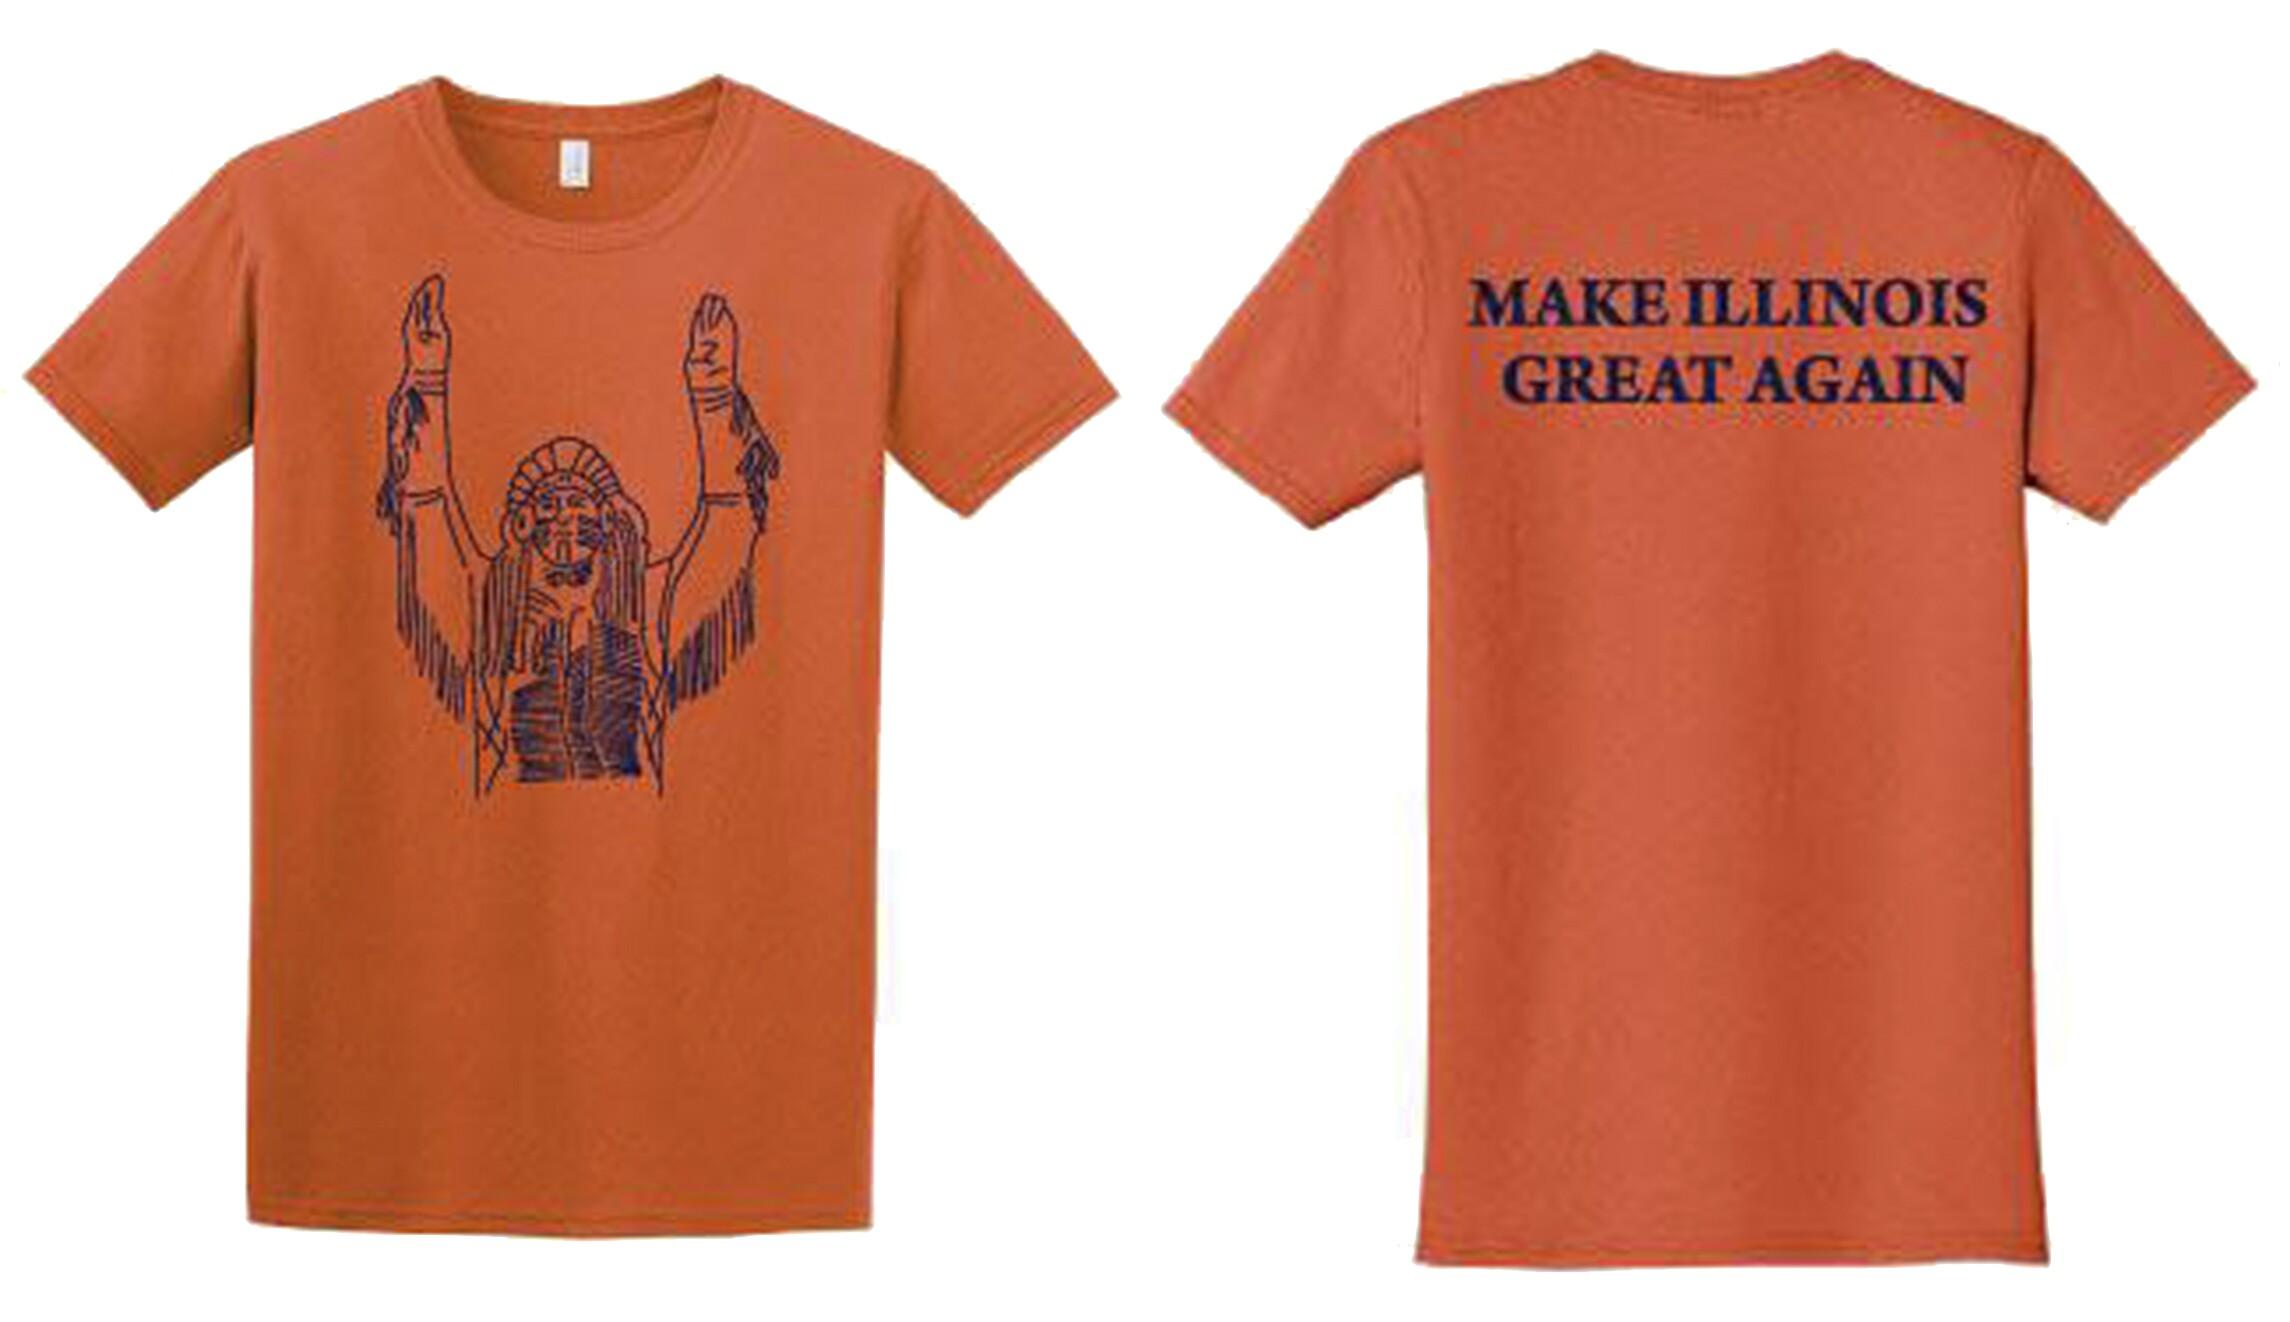 university of illinois sues over make illinois great again shirts